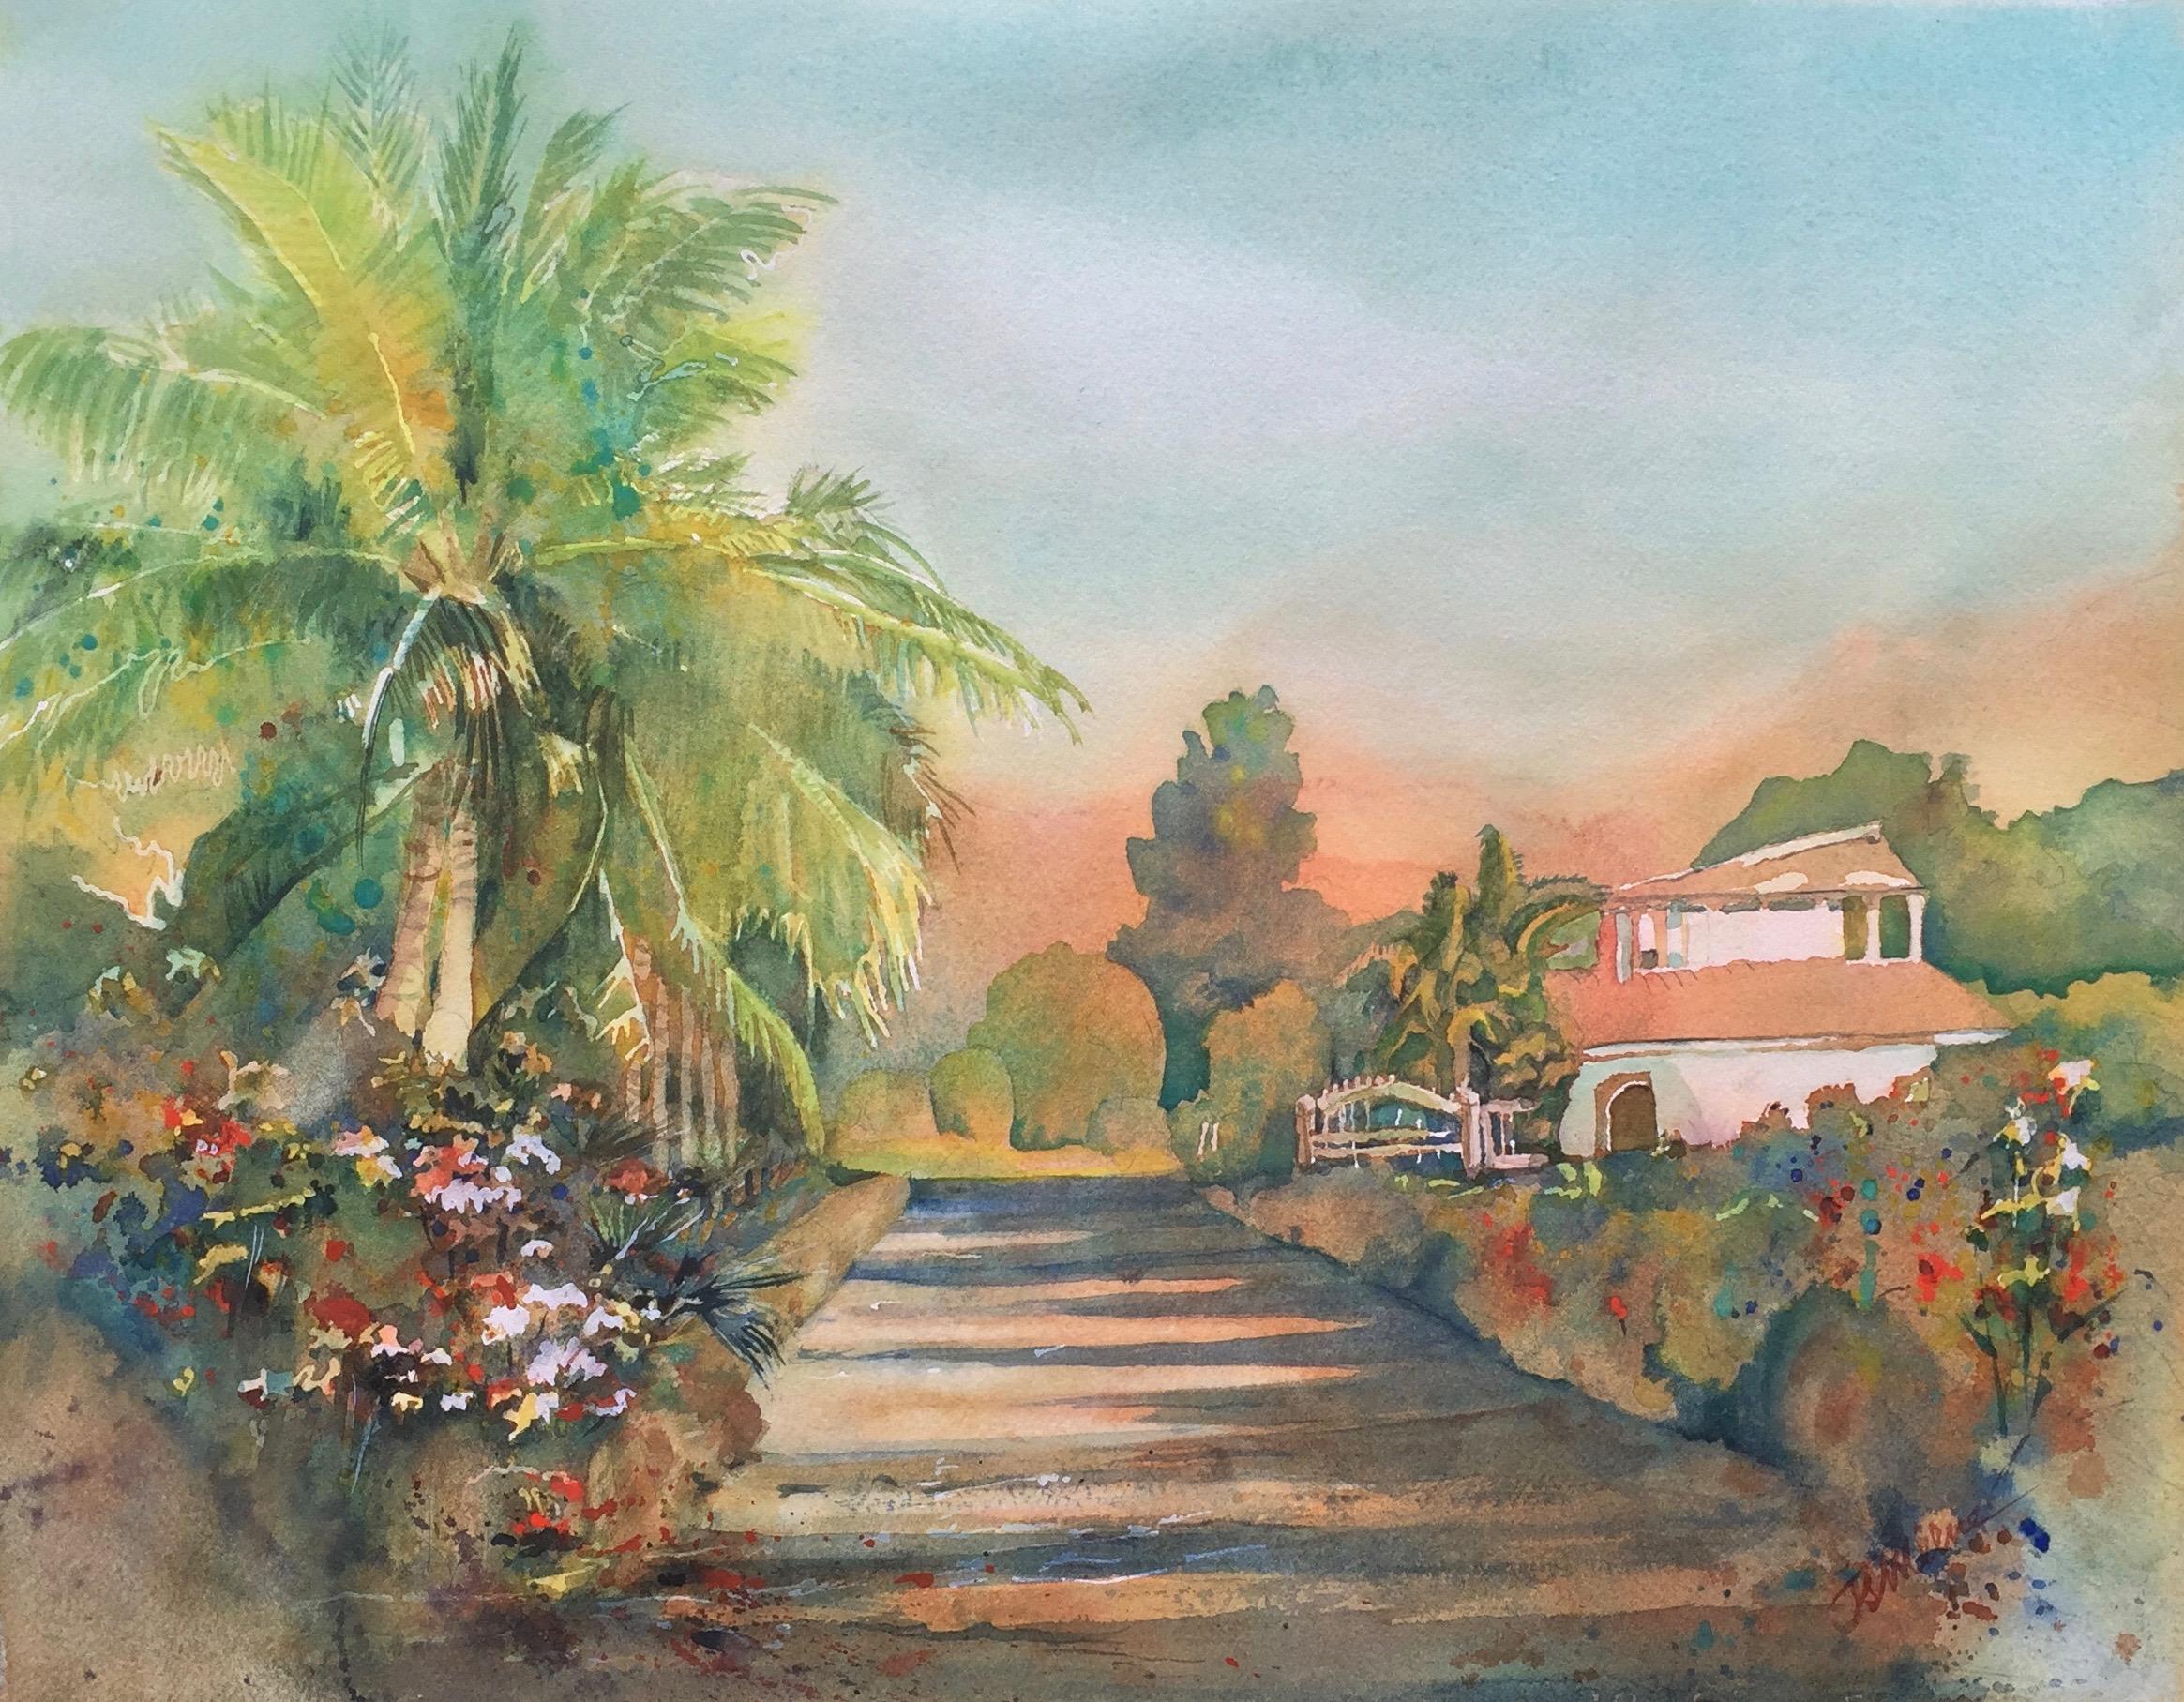 Scarlett Milne Fine Art / Juniper Studio